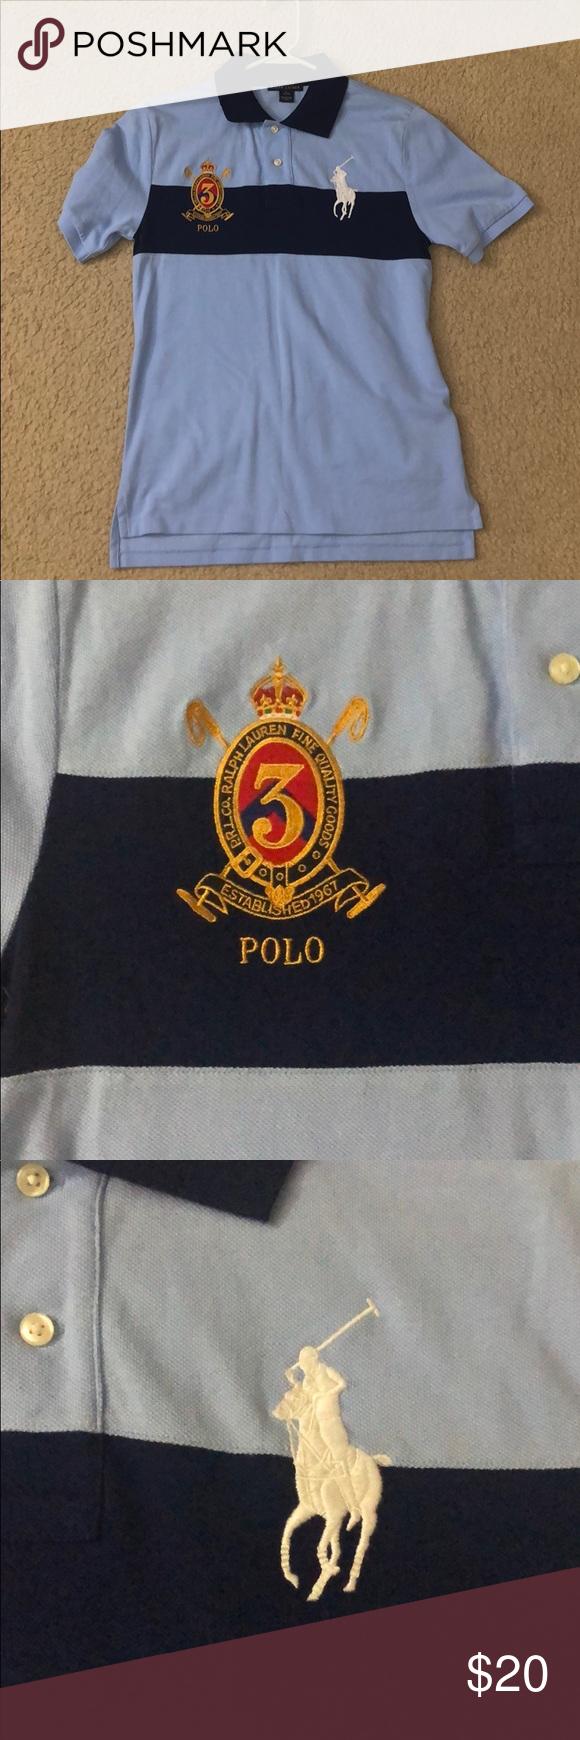 Boys polo shirt Short sleeve boys Polo Ralph Lauren collar shit  I